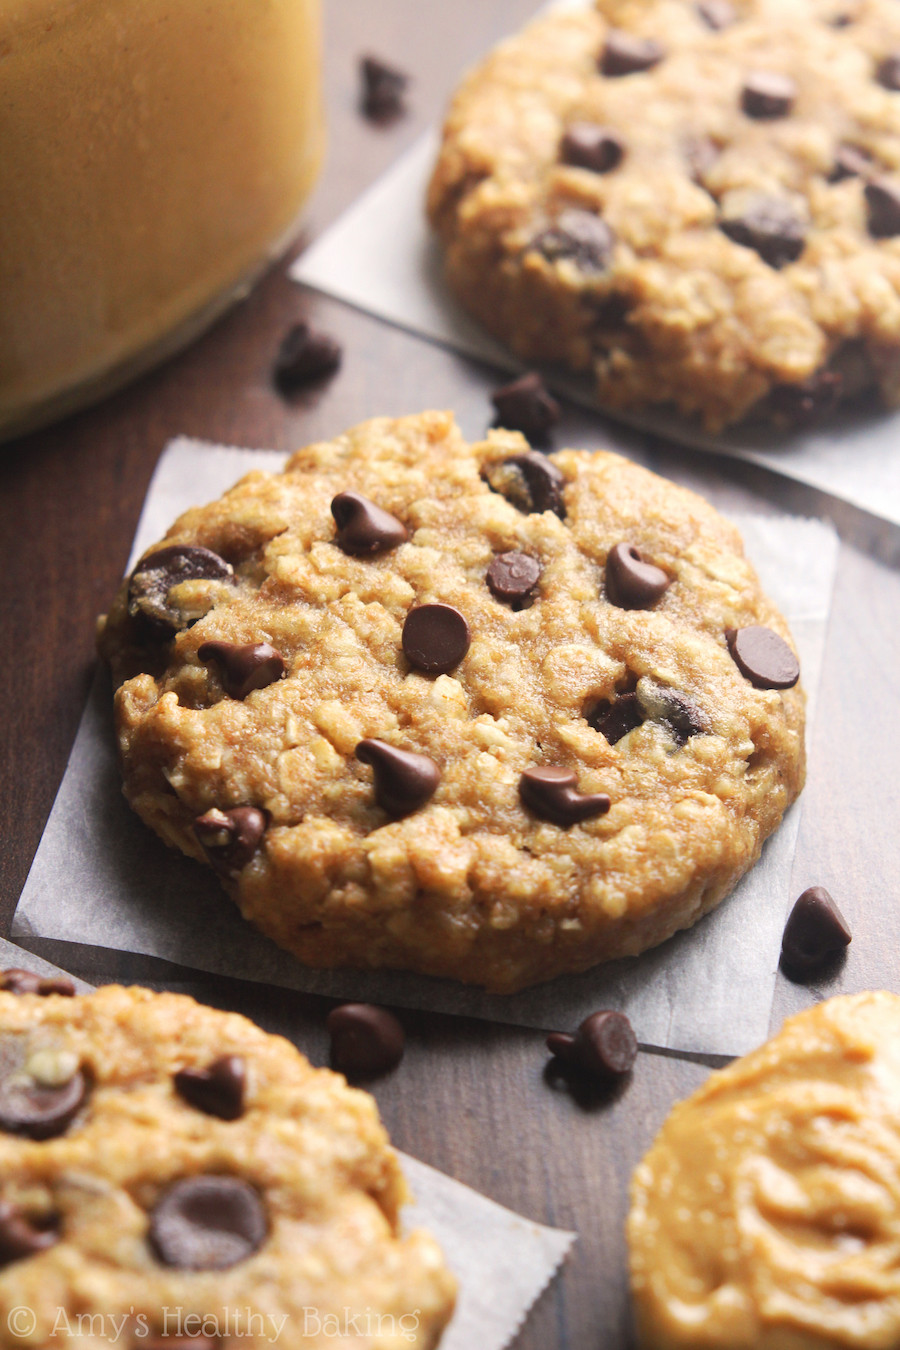 Peanut Butter Oatmeal Cookies Healthy  Chocolate Chip Peanut Butter Oatmeal Cookies Recipe Video